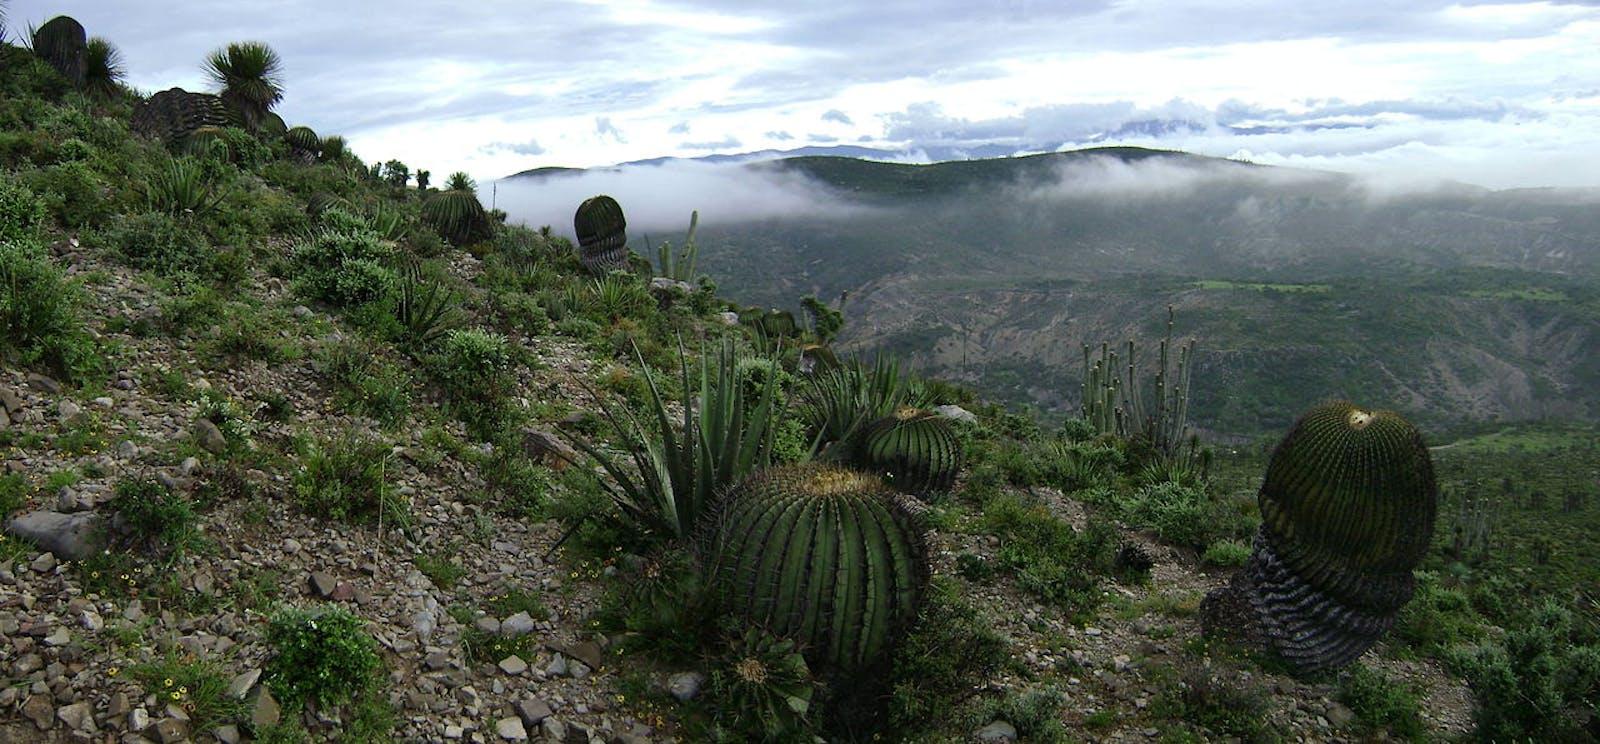 Tehuacán Valley Matorral